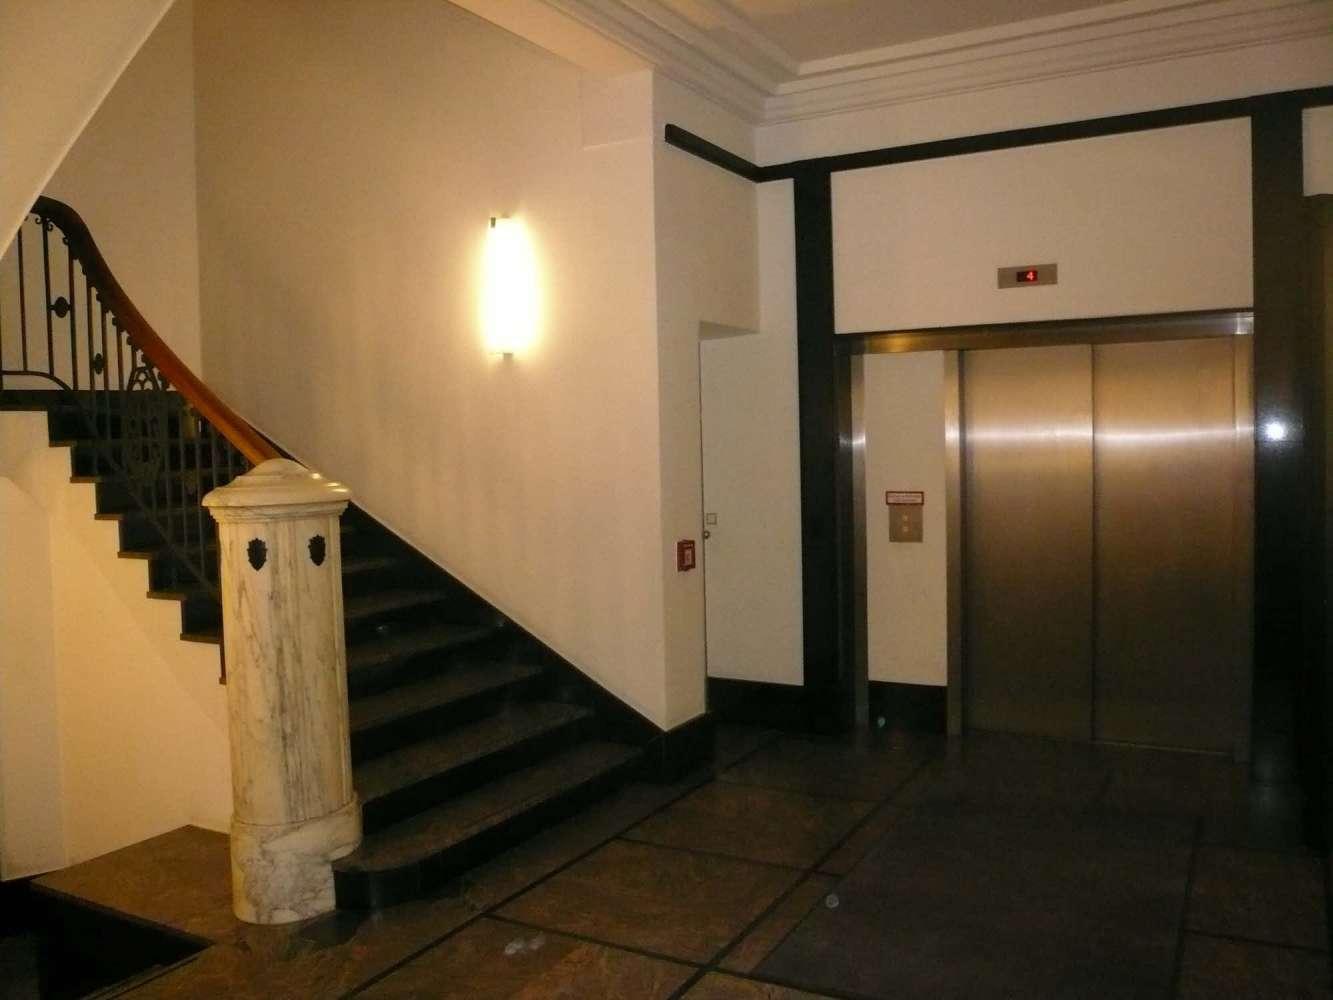 Büros Hamburg, 20095 - Büro - Hamburg, Hamburg-Altstadt - H0644 - 9550729